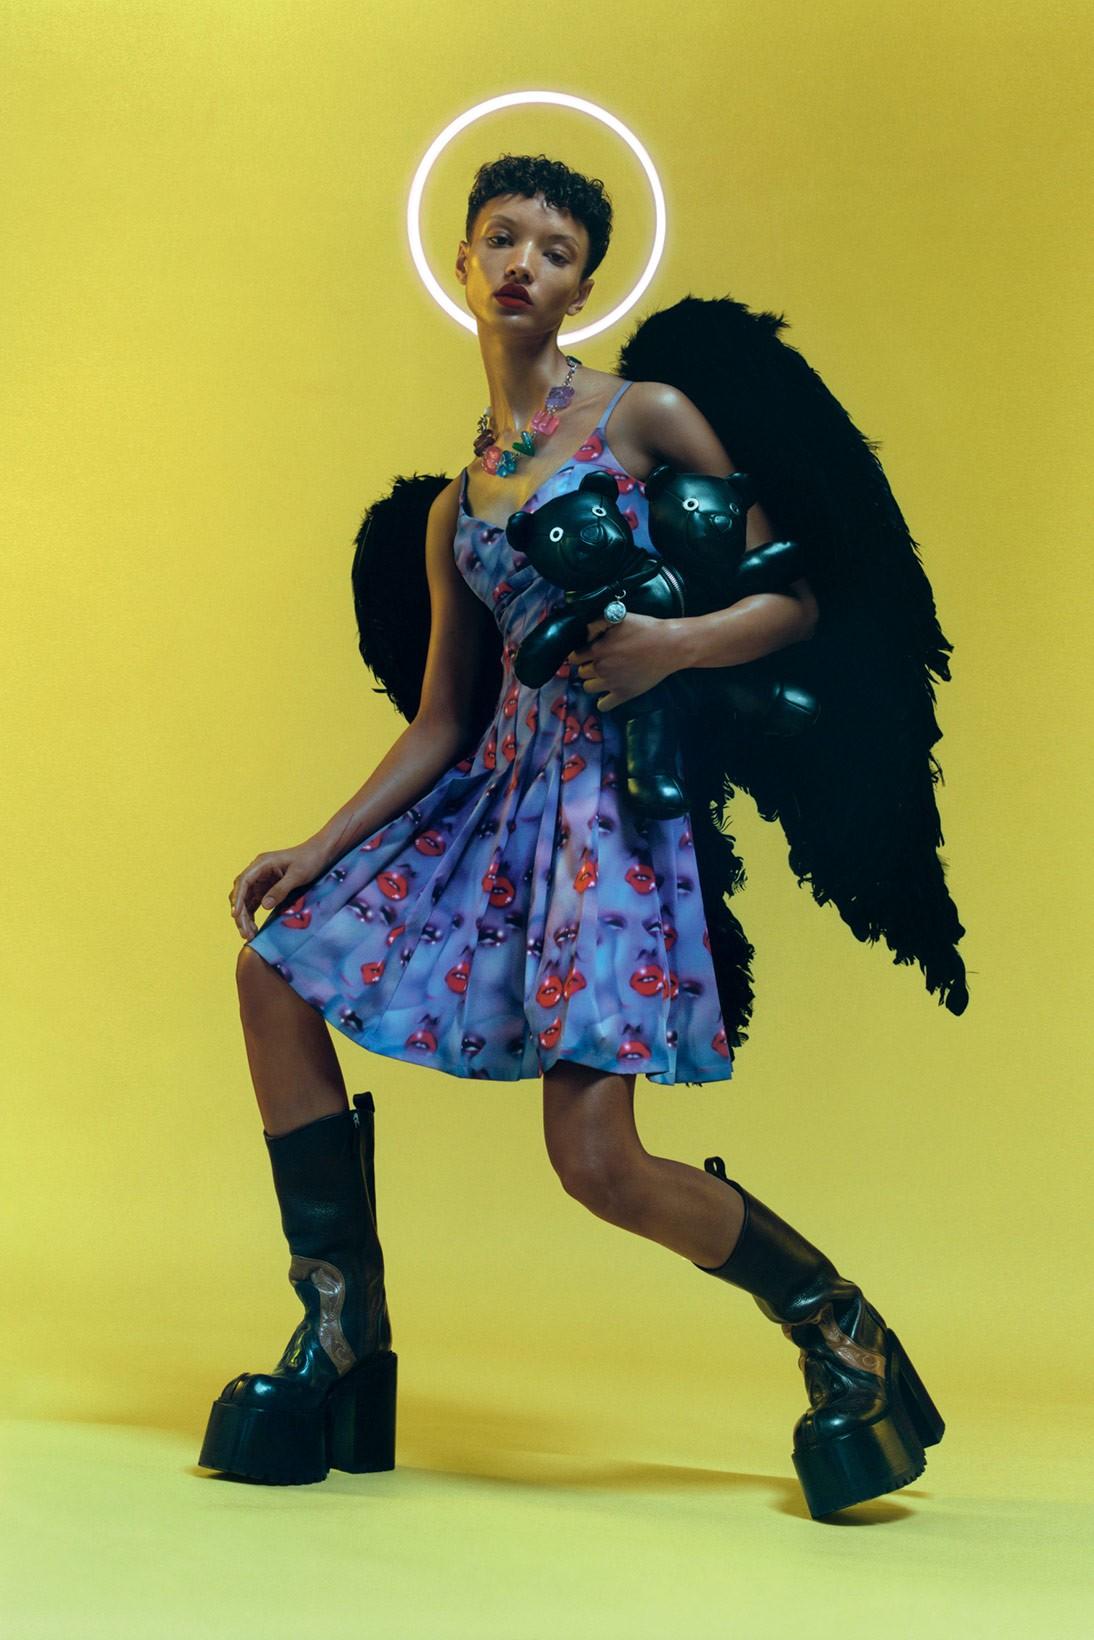 Heaven ss21 by Marc Jacobs. Fotografía. Harley Weir